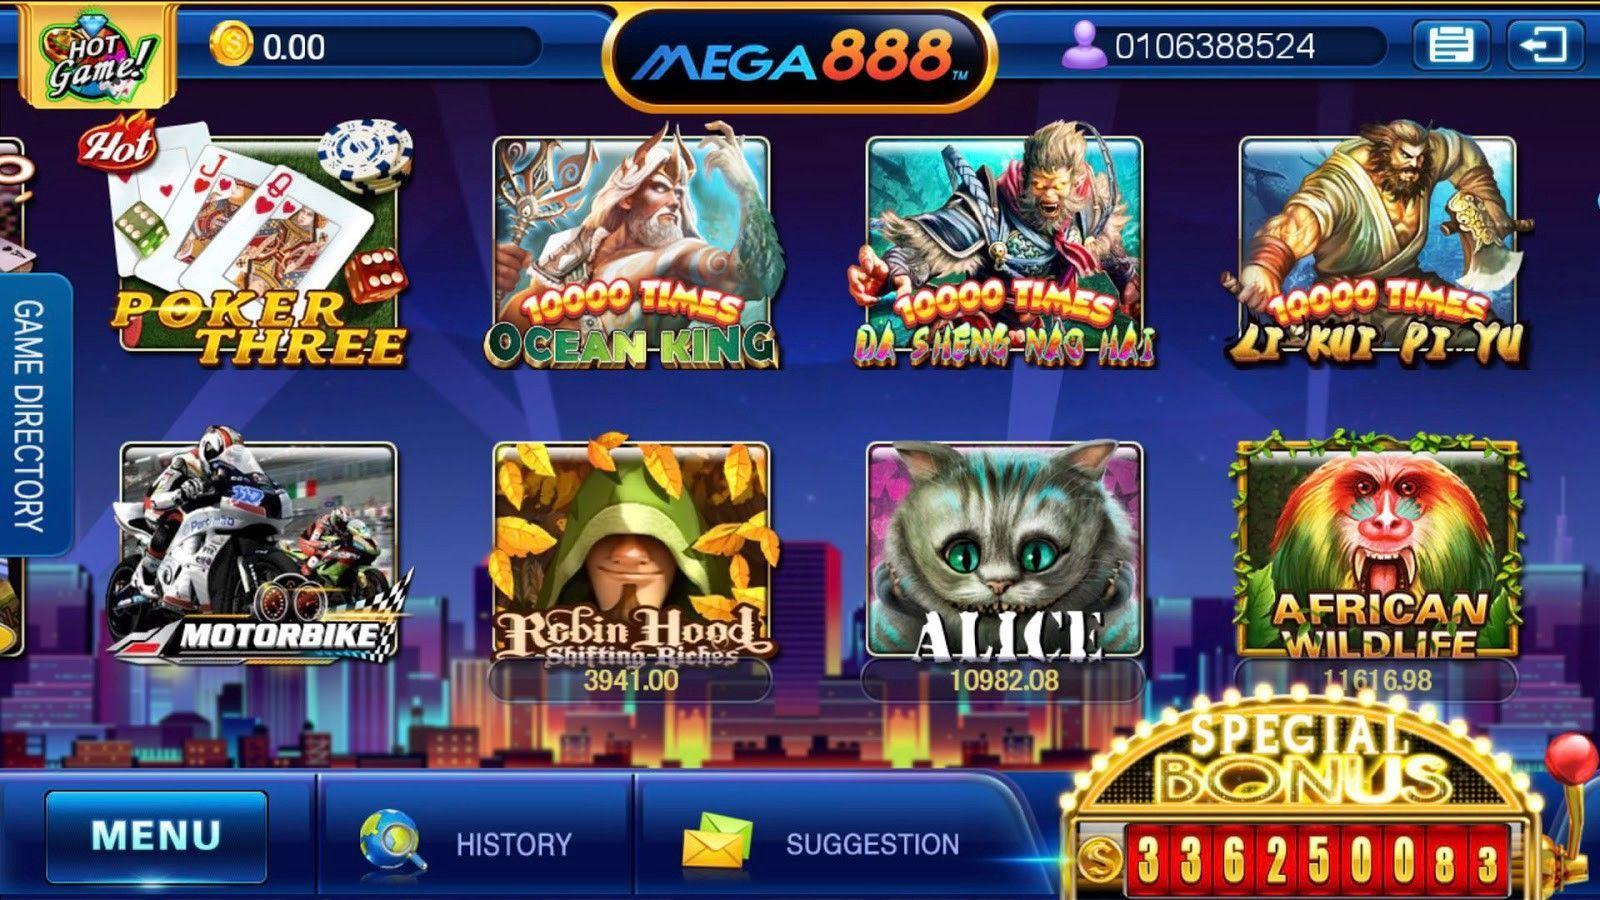 #mega888_hack #mega888_download #mega888_id_test #mega888_game_list